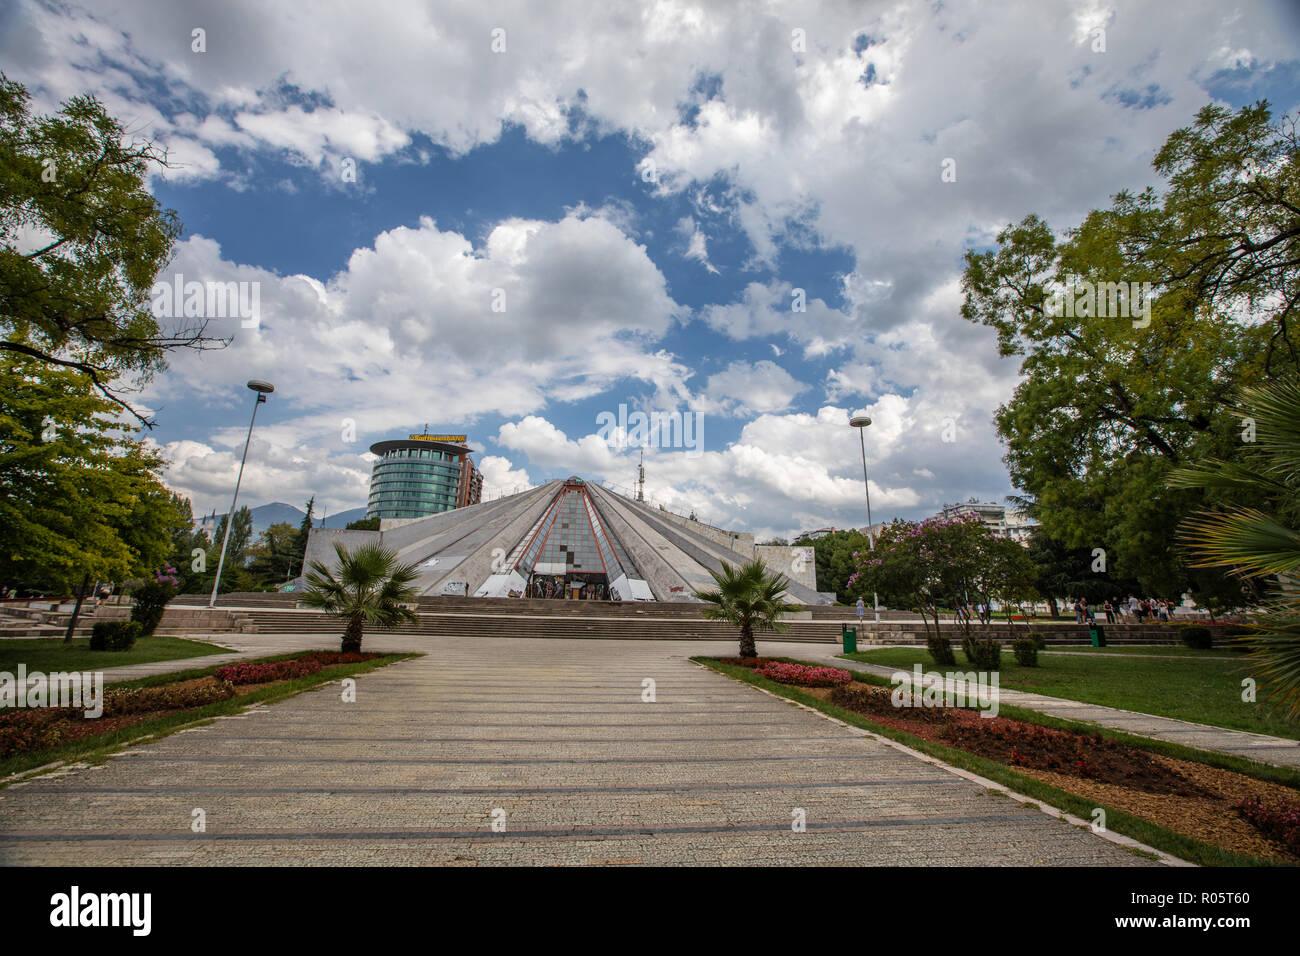 Mausoleum in Tirana, Albania. - Stock Image